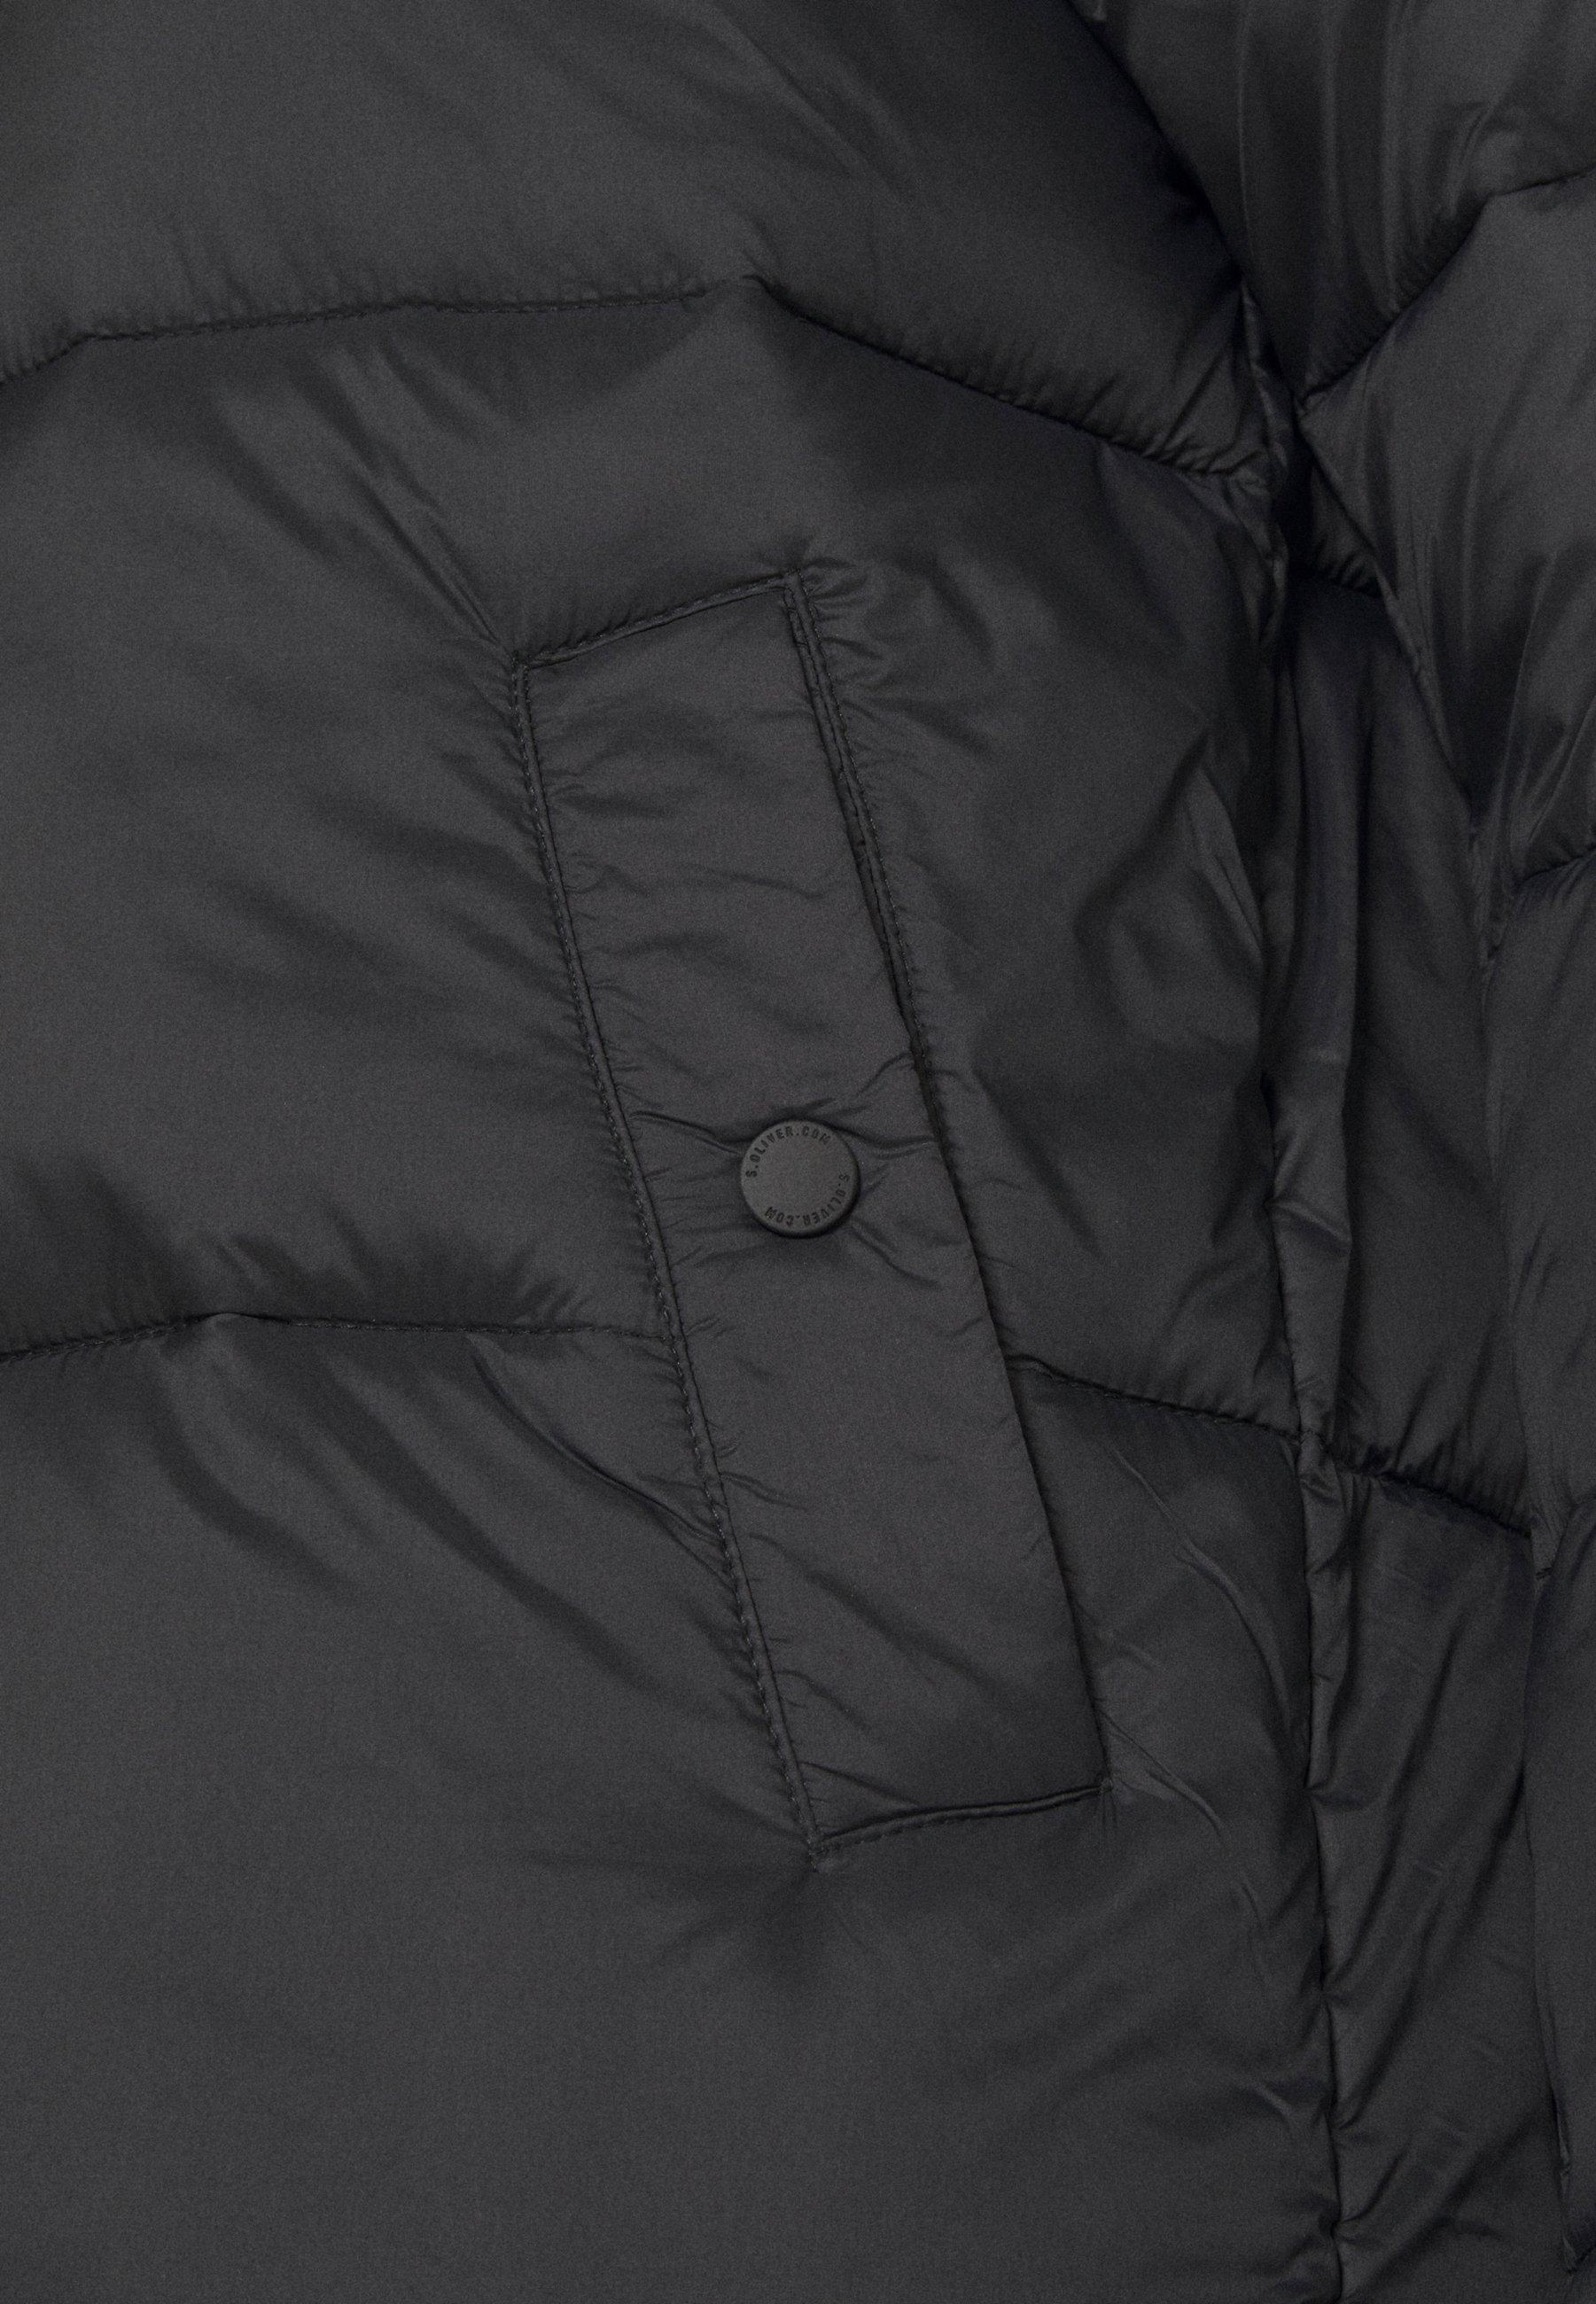 Recommend Women's Clothing s.Oliver Winter jacket black eIFHLXtgF